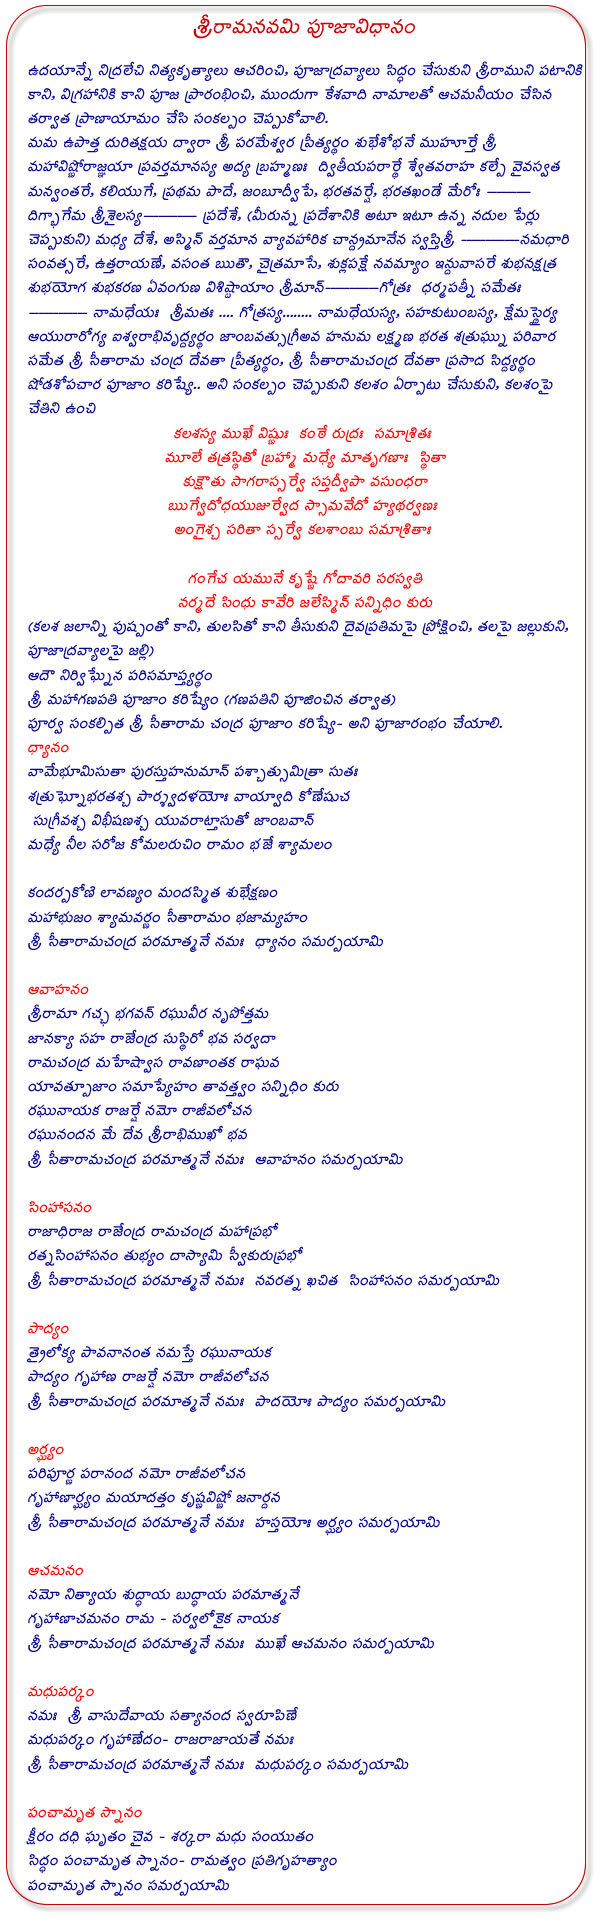 Sri Rama Navami Puja Vidanam-1 - Telugu Devotional songs